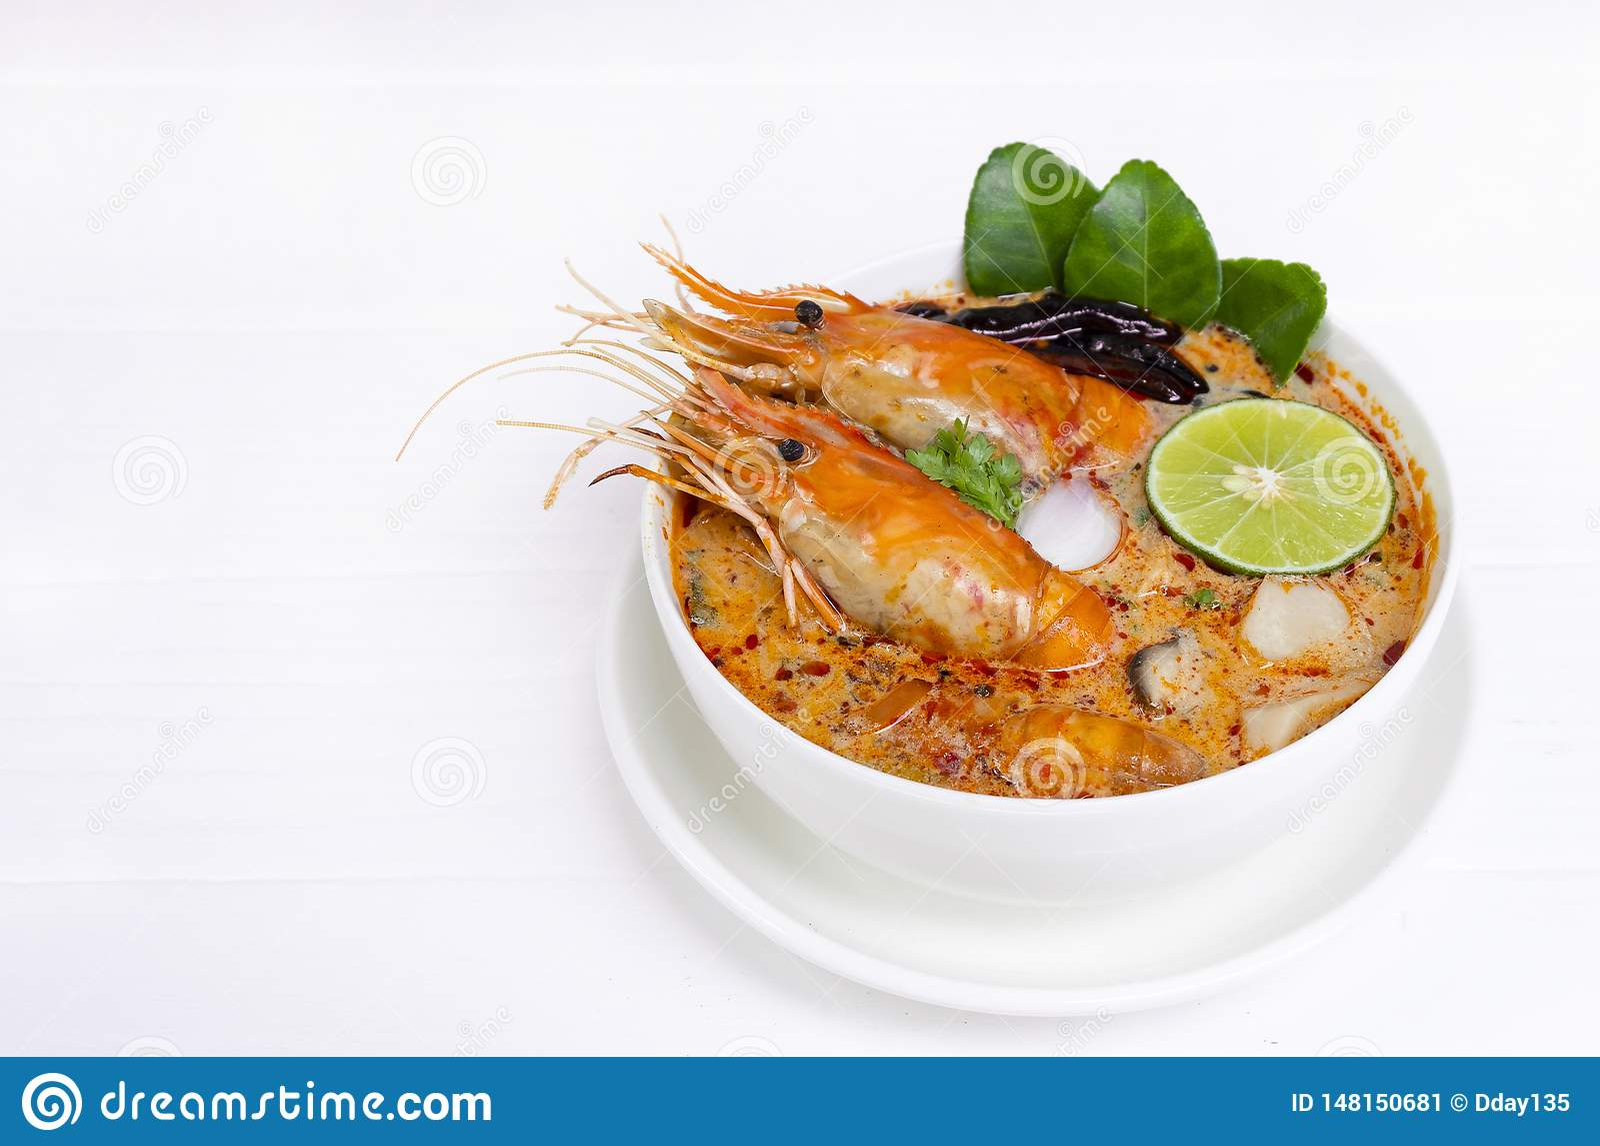 Том Yum еда пряного кислого супа супа Goong или креветки традиционная в Таиланде